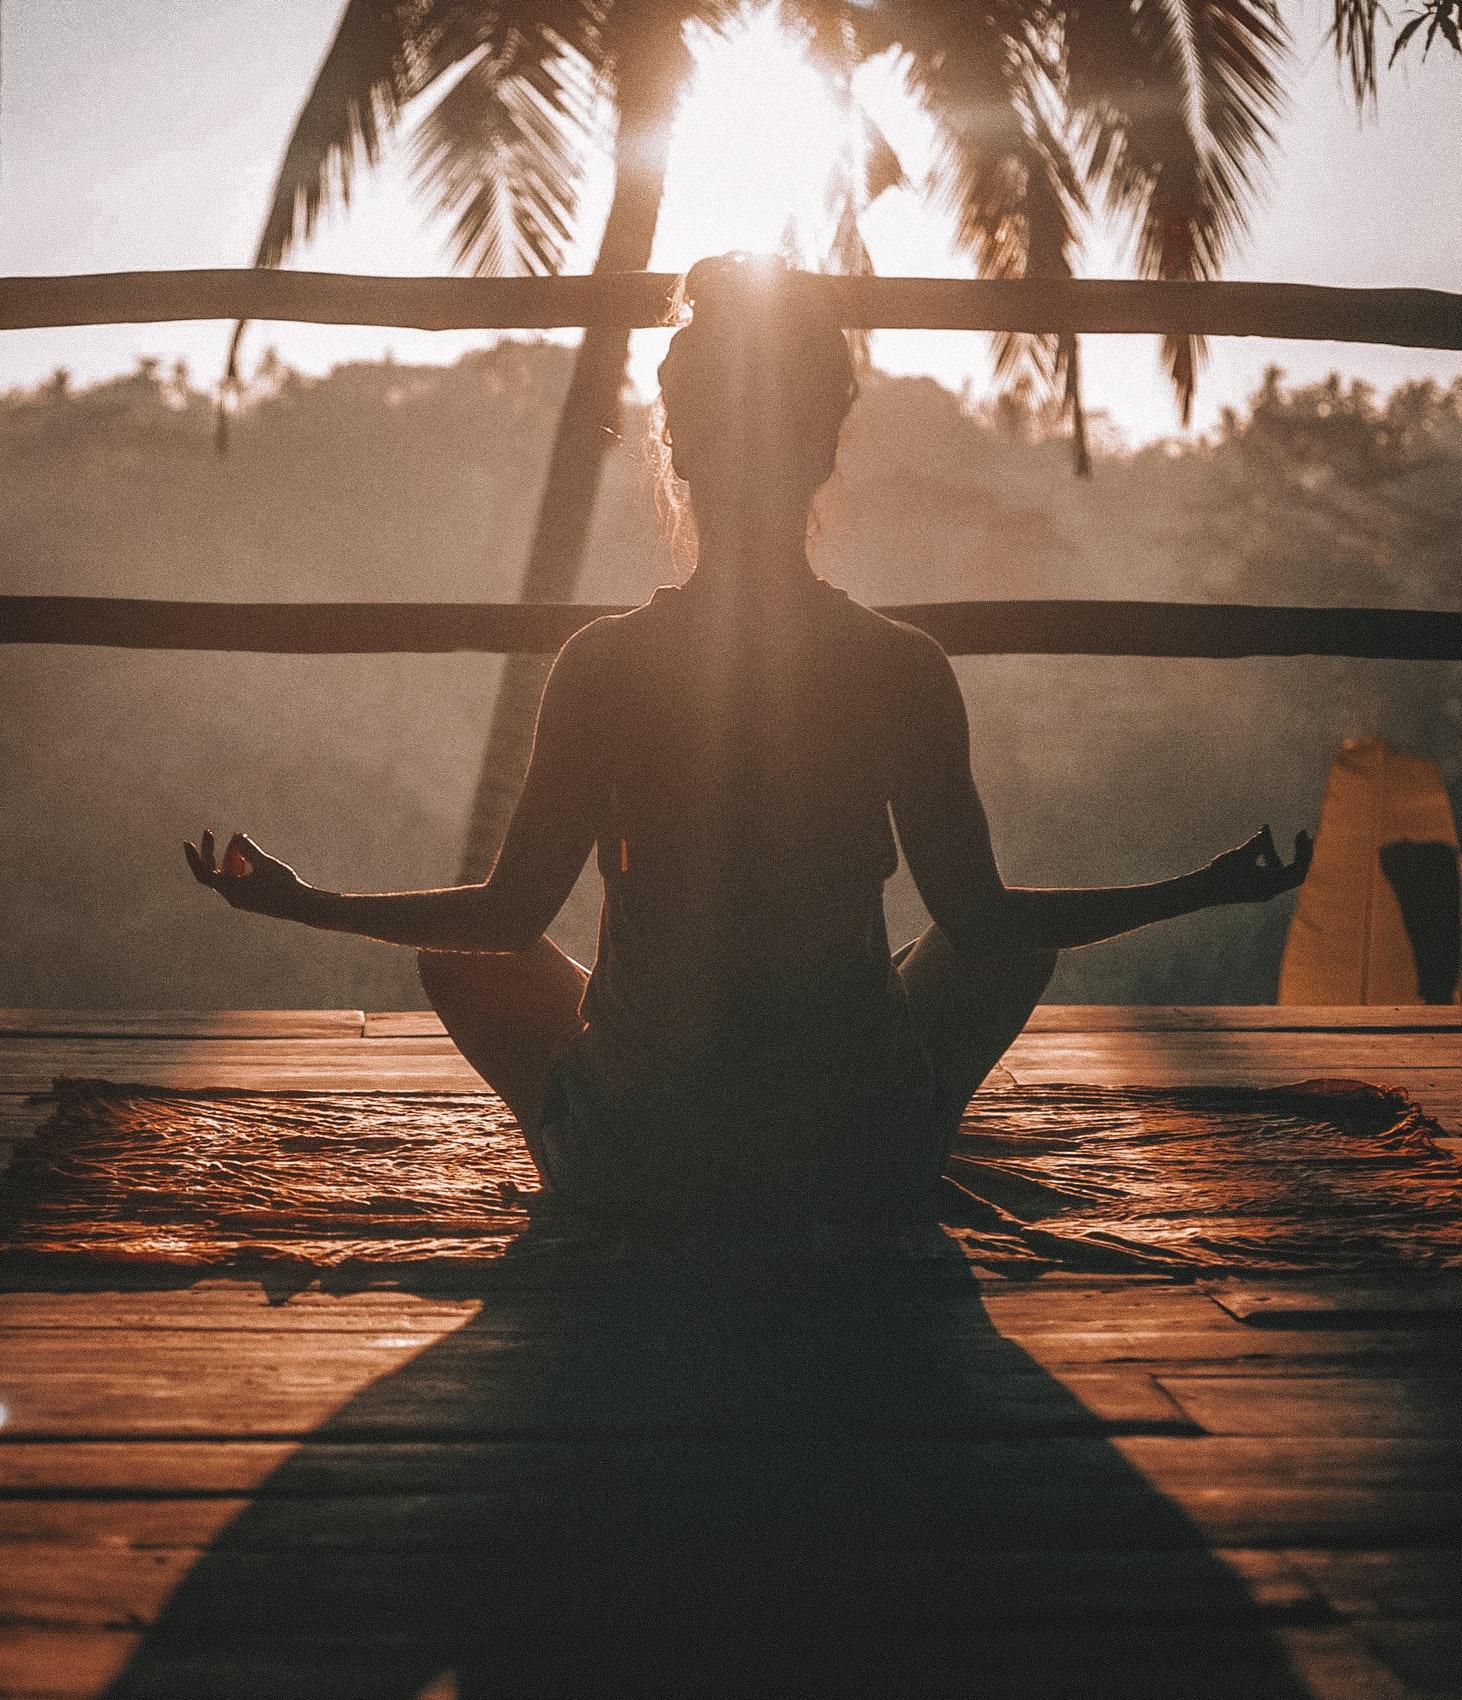 The Ultimate Self-Care Ritual